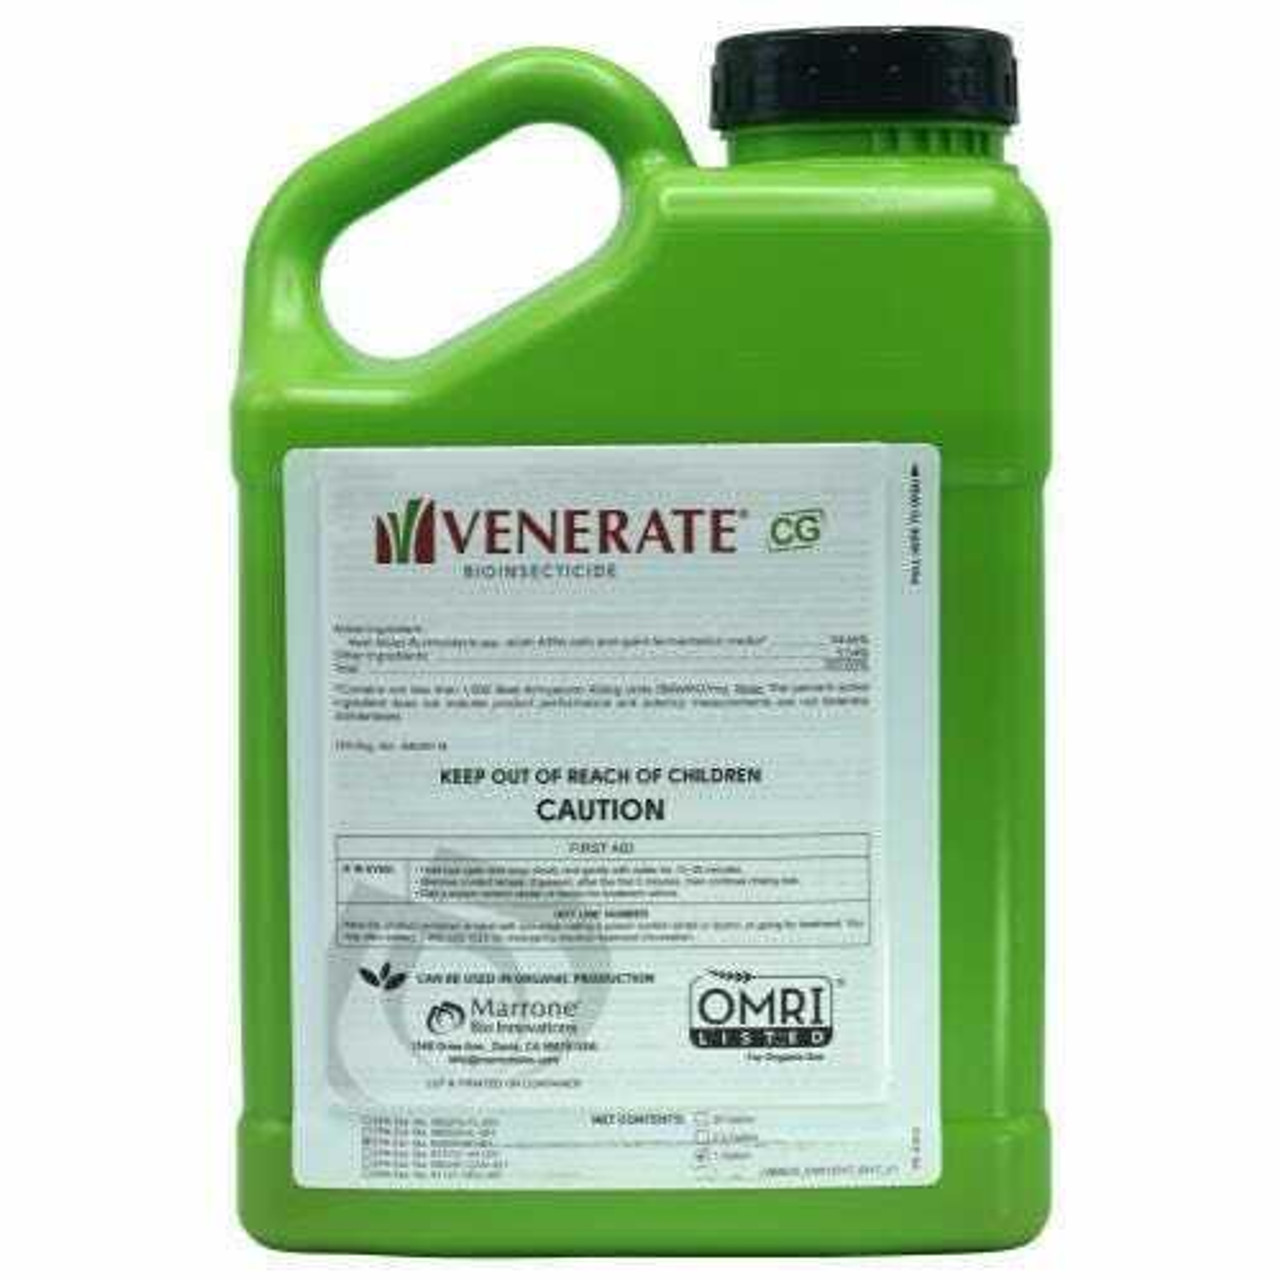 Marrone Bio Innovations Venerate CG Gallon